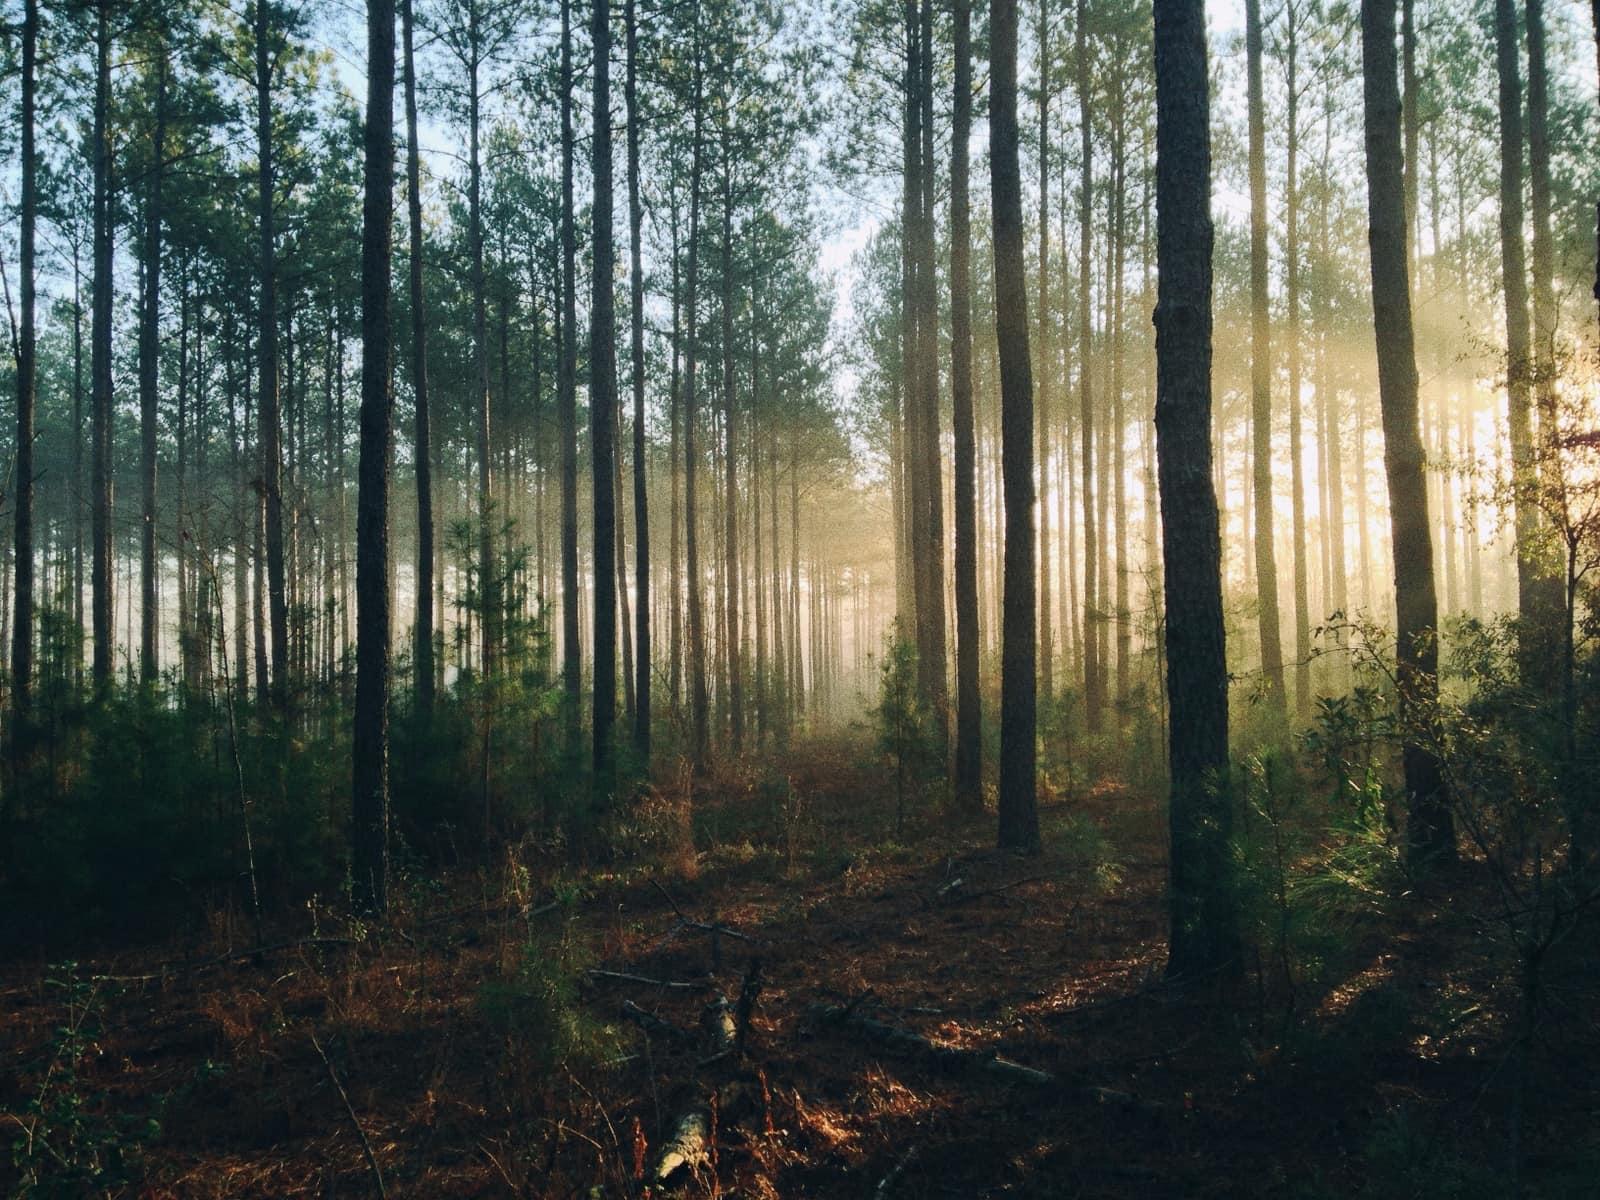 Greenly - Comment compenser son bilan carbone ?